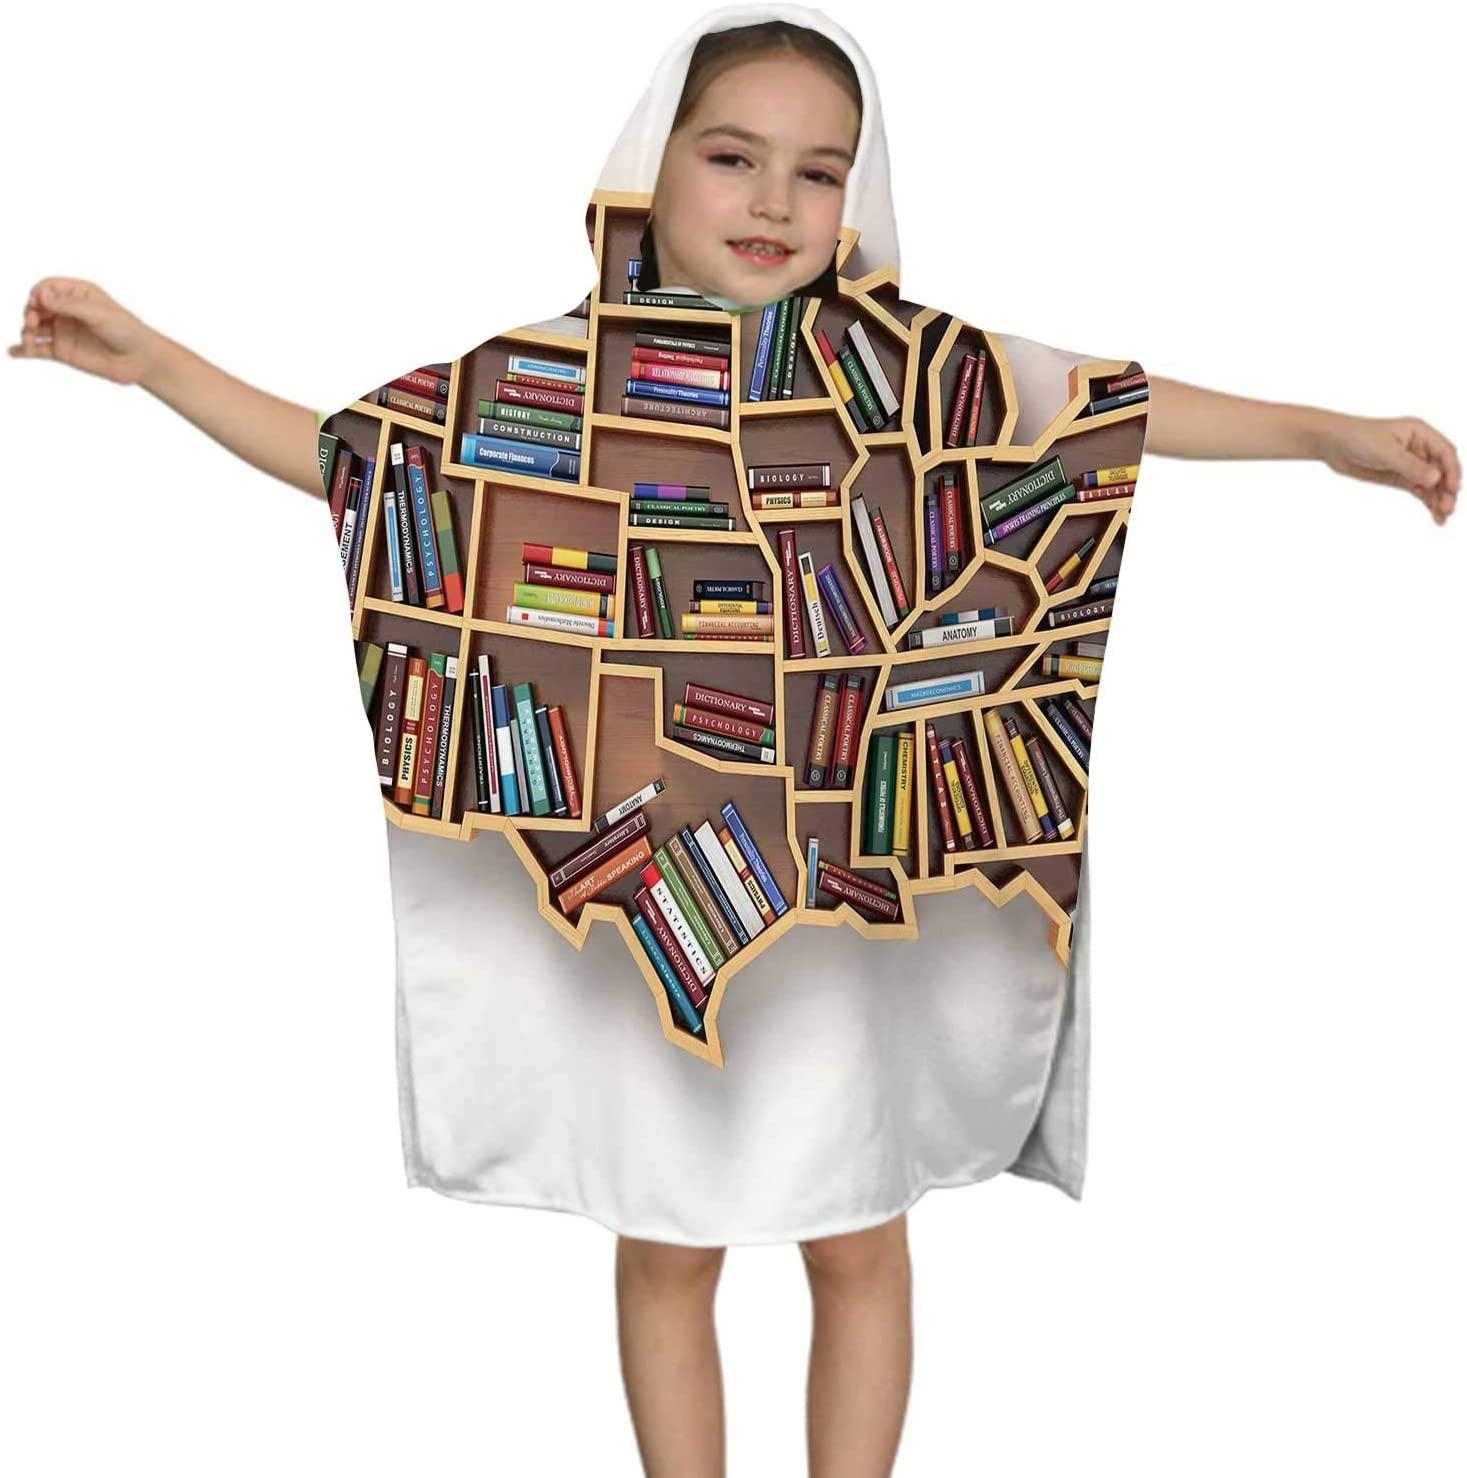 C COABALLA USA Education or Market of Books Concept.Book Shelf as map USA.3D,Kids Hooded Beach Bath Towel - Swim Pool Coverup Poncho Cape Multi-use